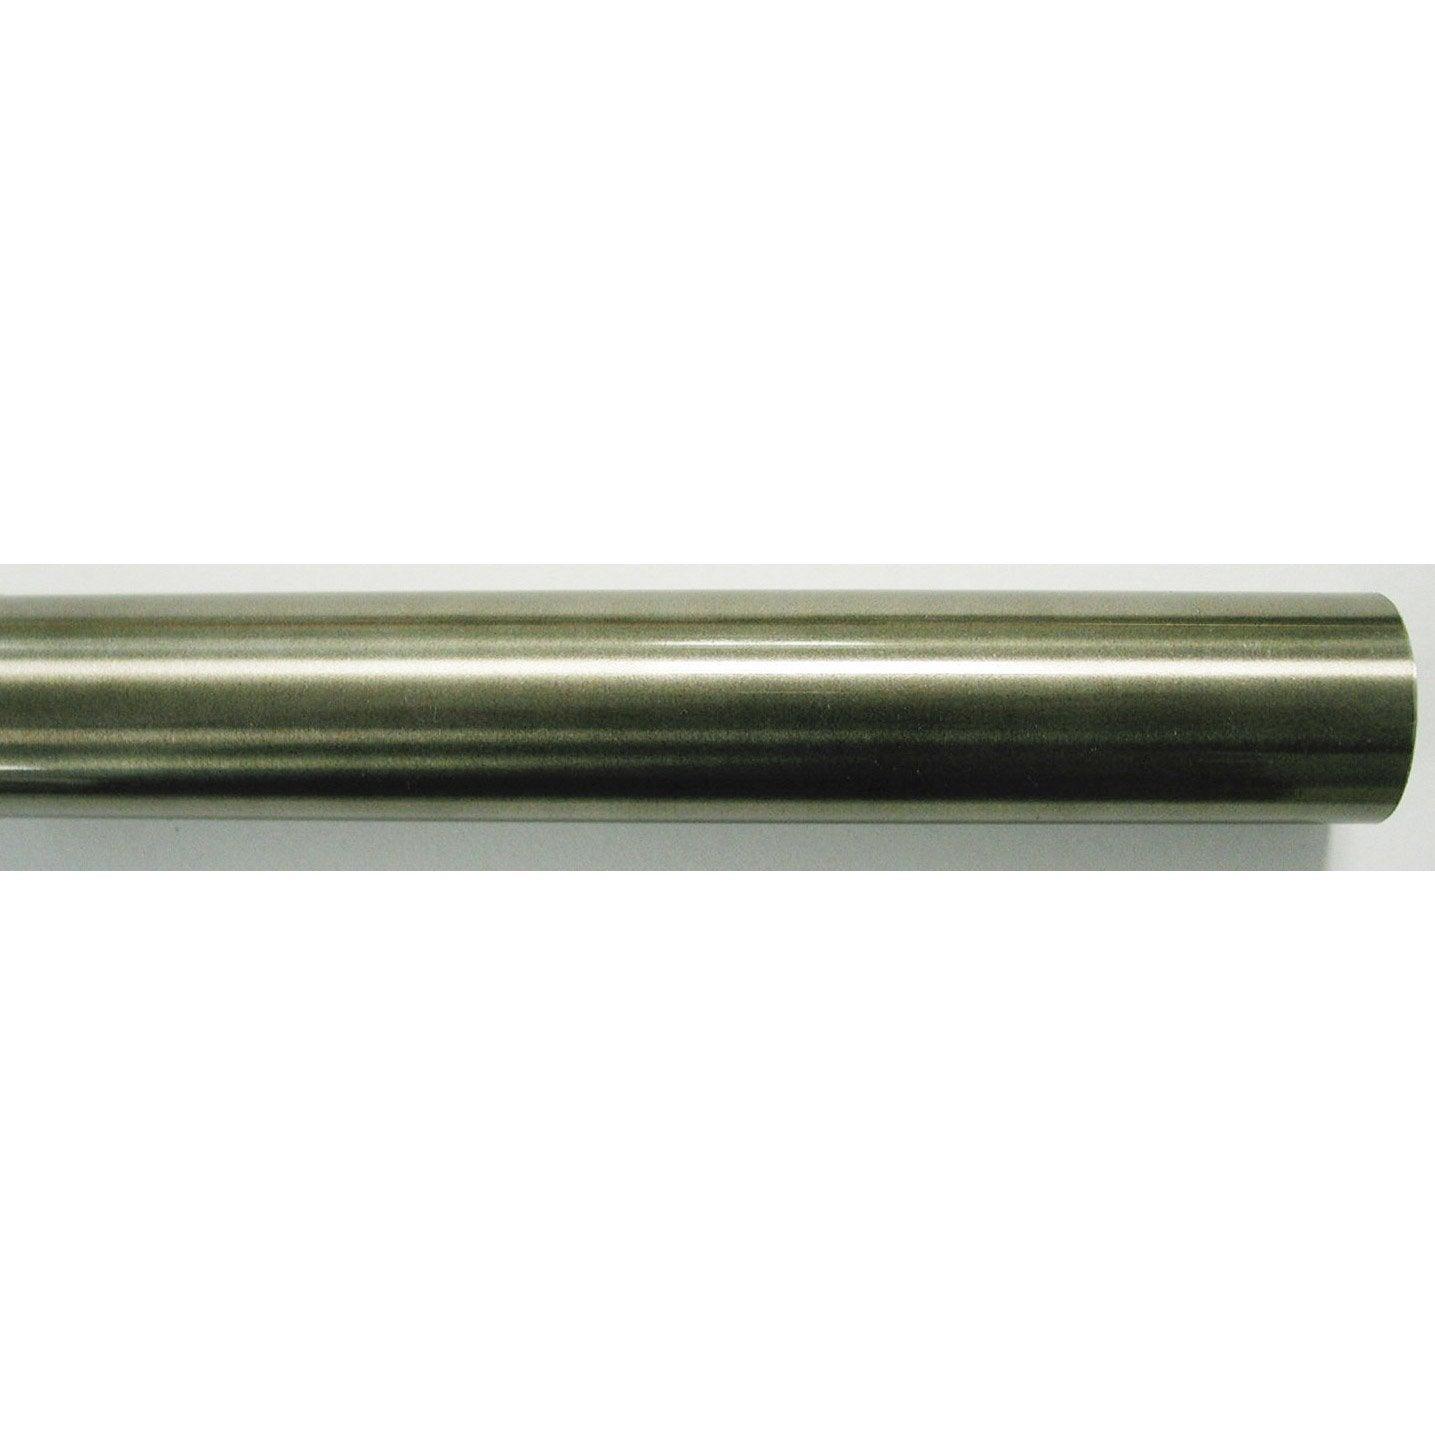 tringle 224 rideau inspire inox 233 tain verni diam 28 mm 200 cm leroy merlin